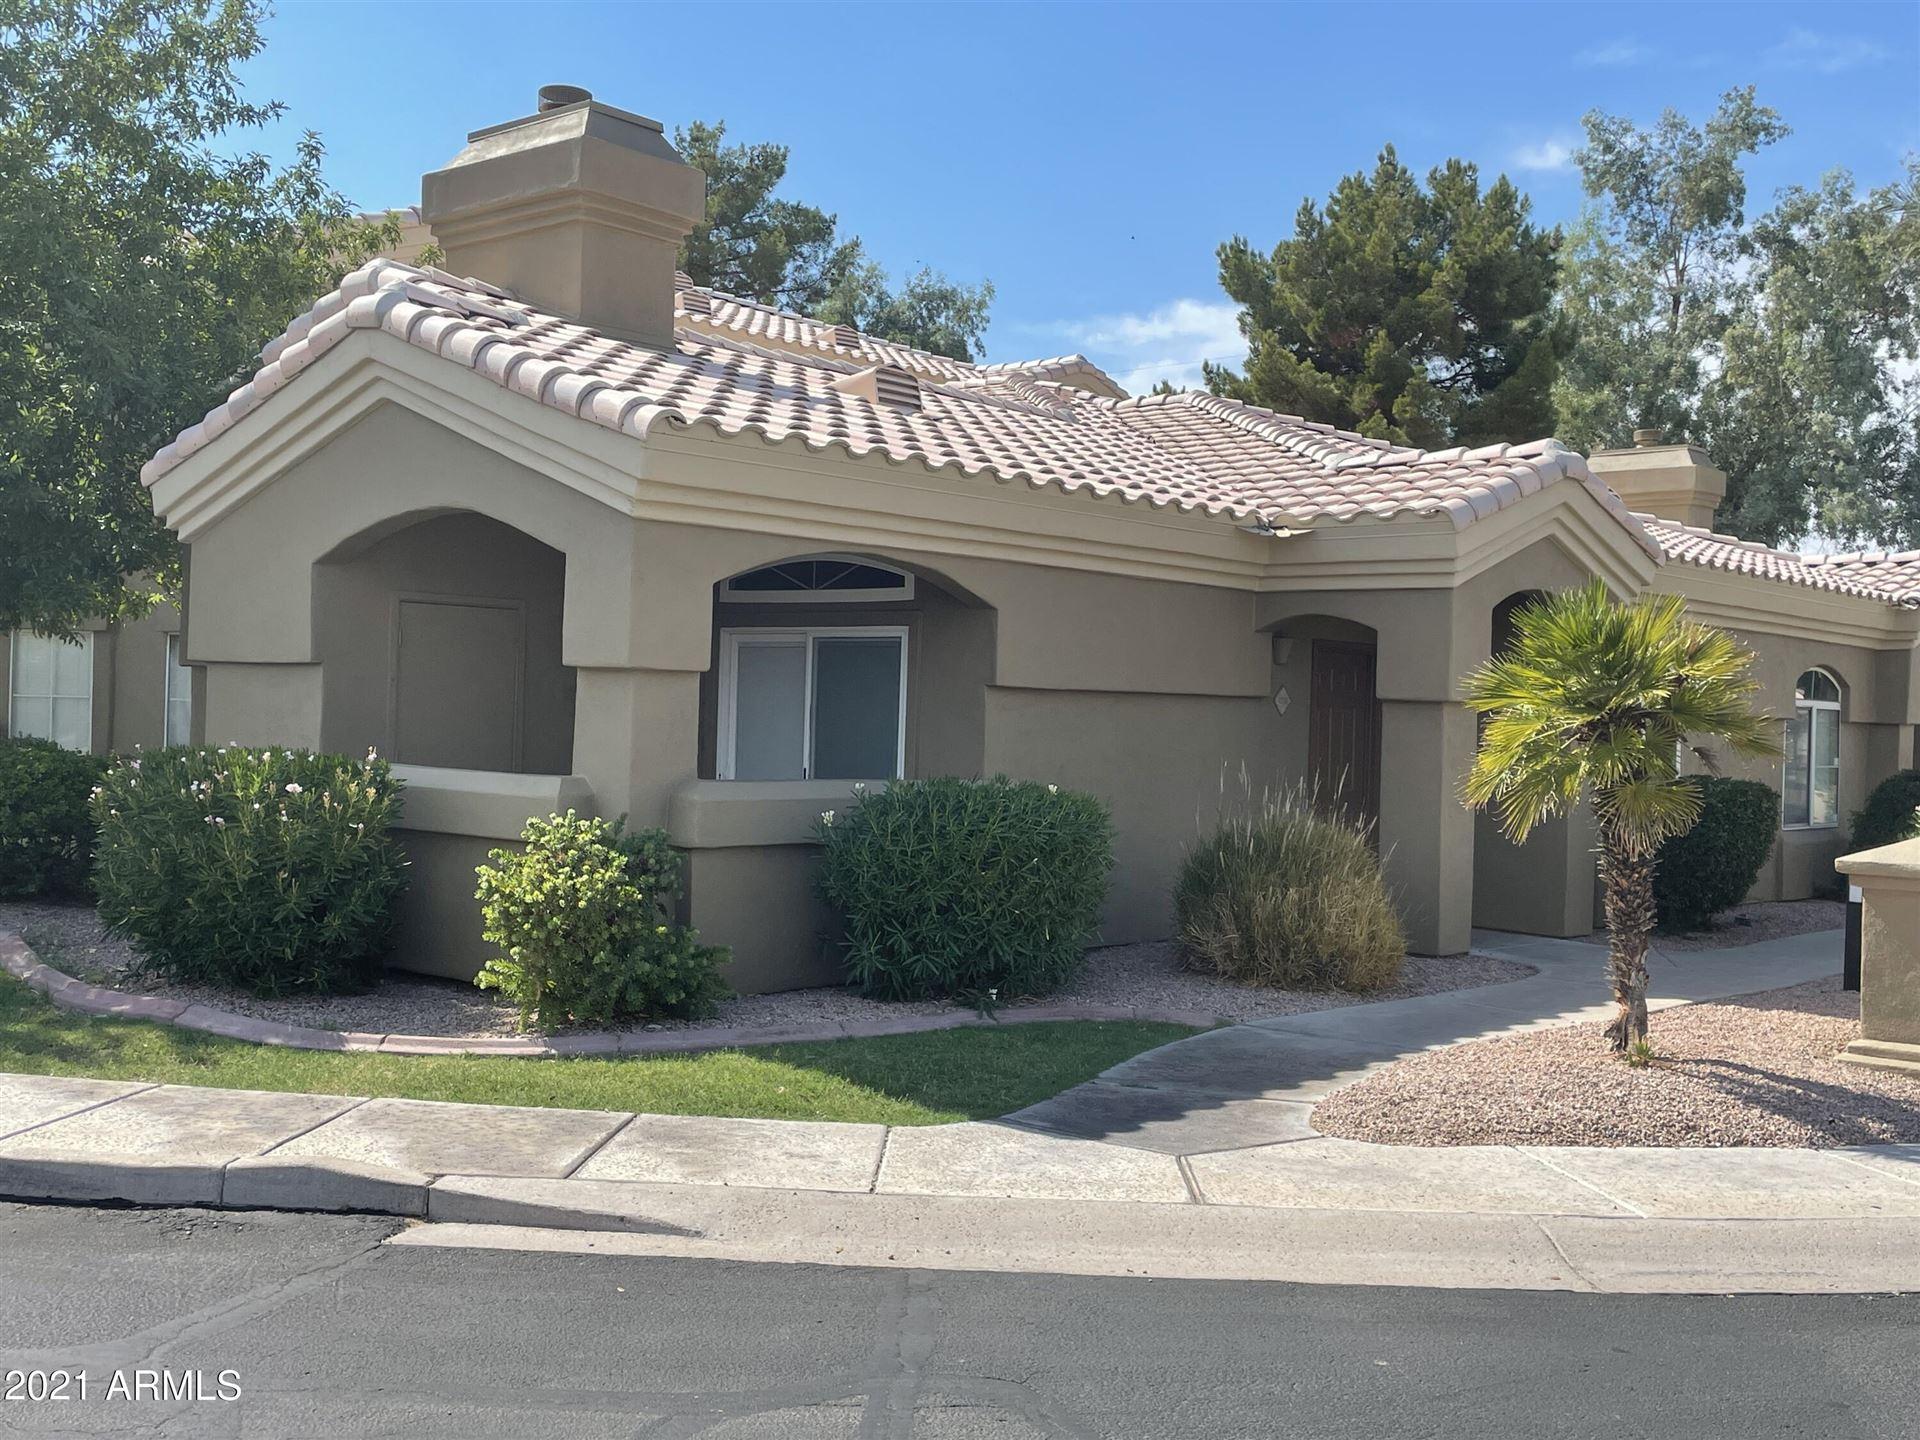 5335 E SHEA Boulevard #1008, Scottsdale, AZ 85254 - MLS#: 6257667